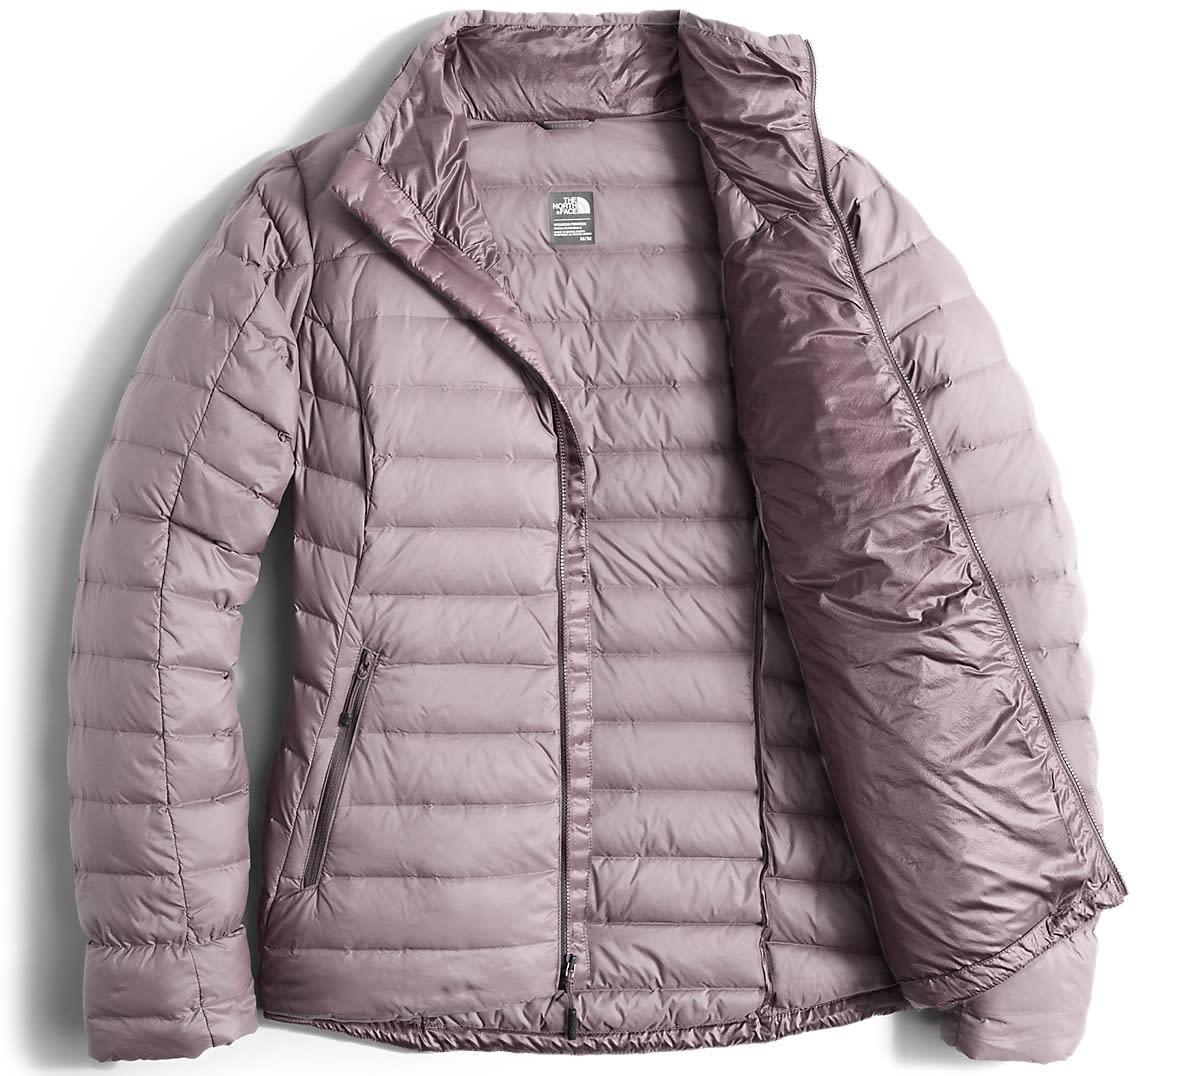 0e6eb5d3f The North Face Morph Jacket - Womens